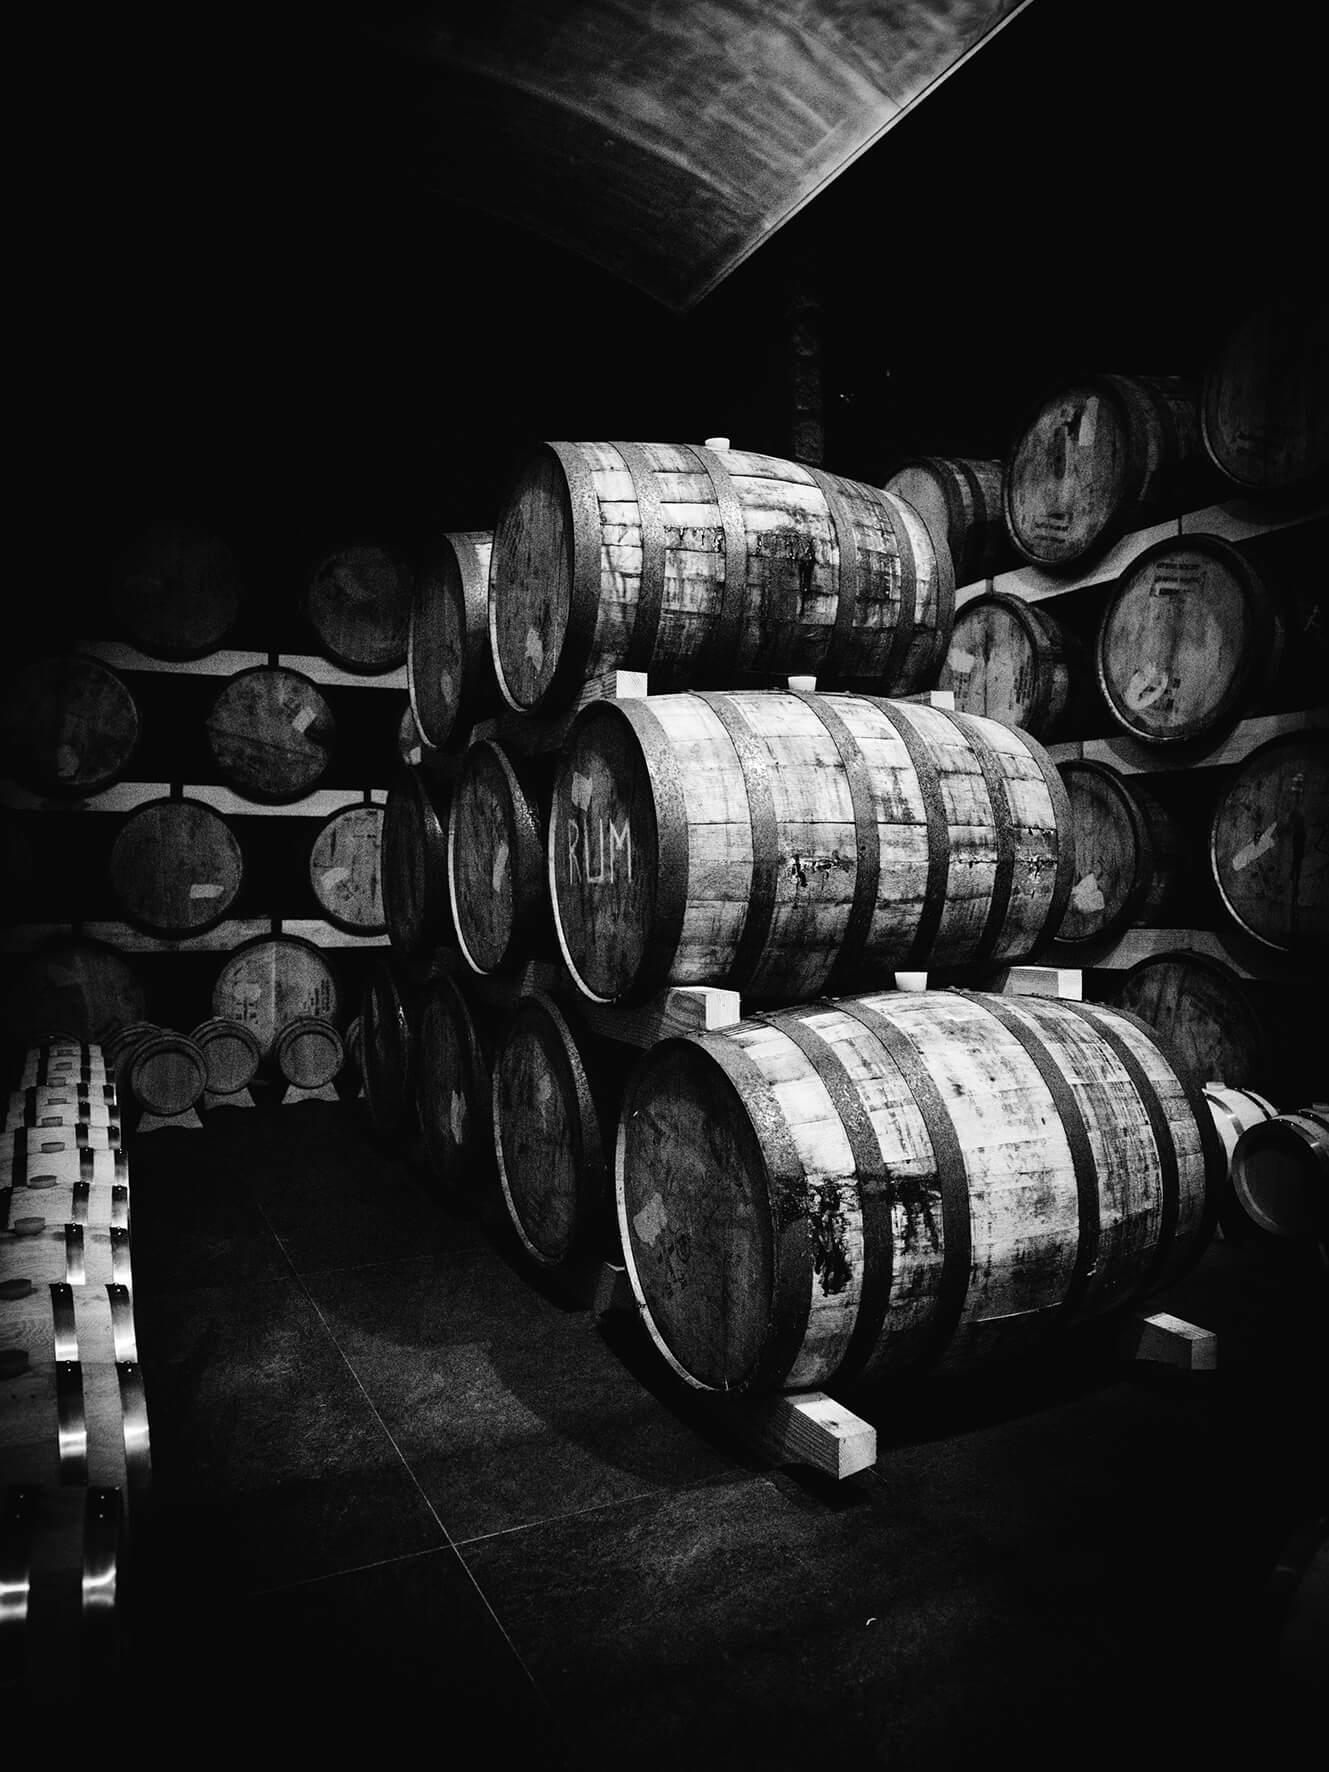 Rum-Fässer